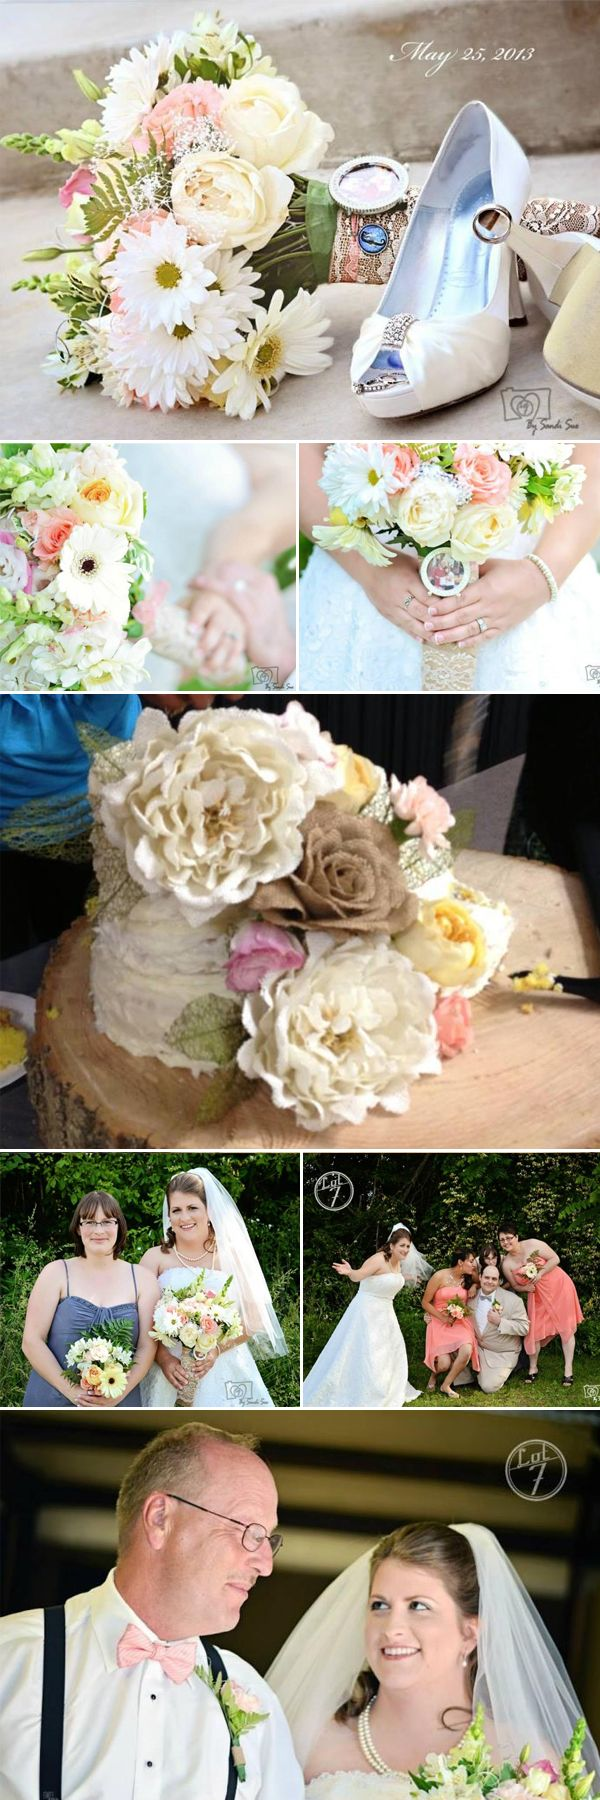 Holiday arrangements wholesale bulk flowers fiftyflowers - Bridal White Flower Centerpieces